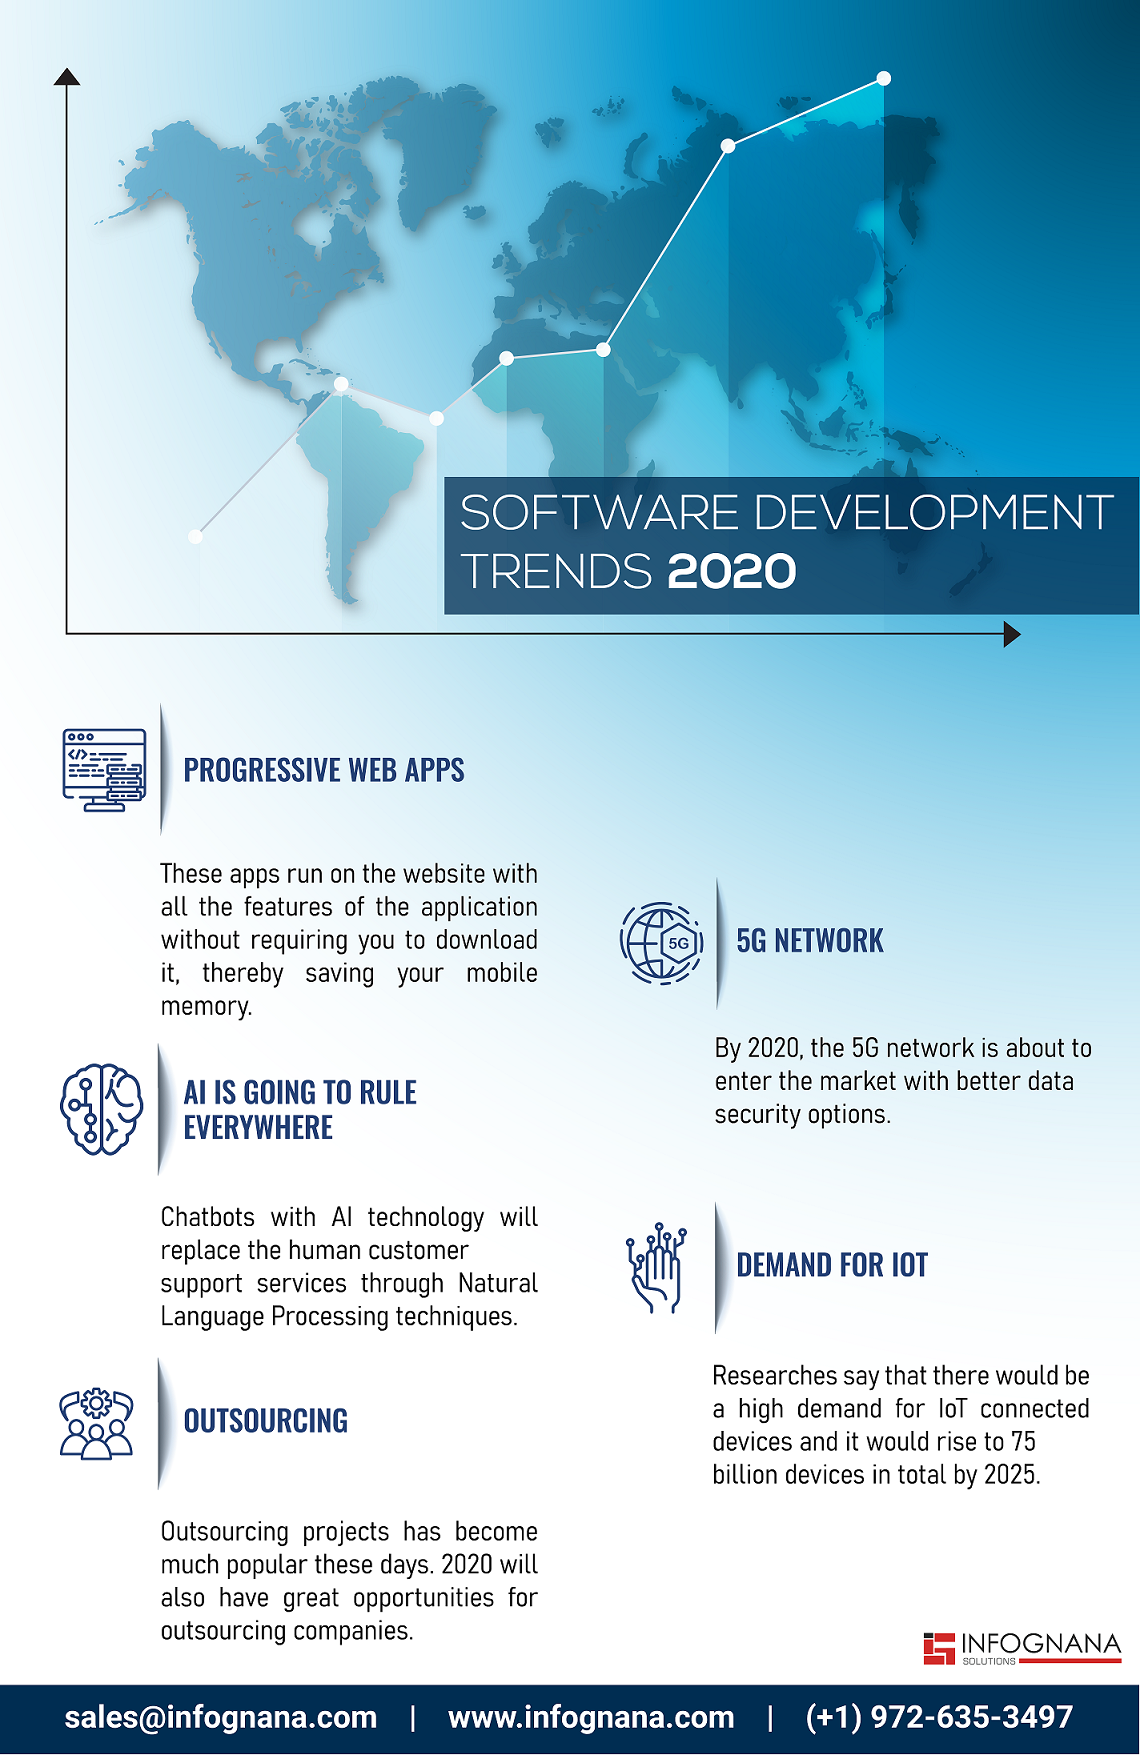 Leading Software Development Company Software